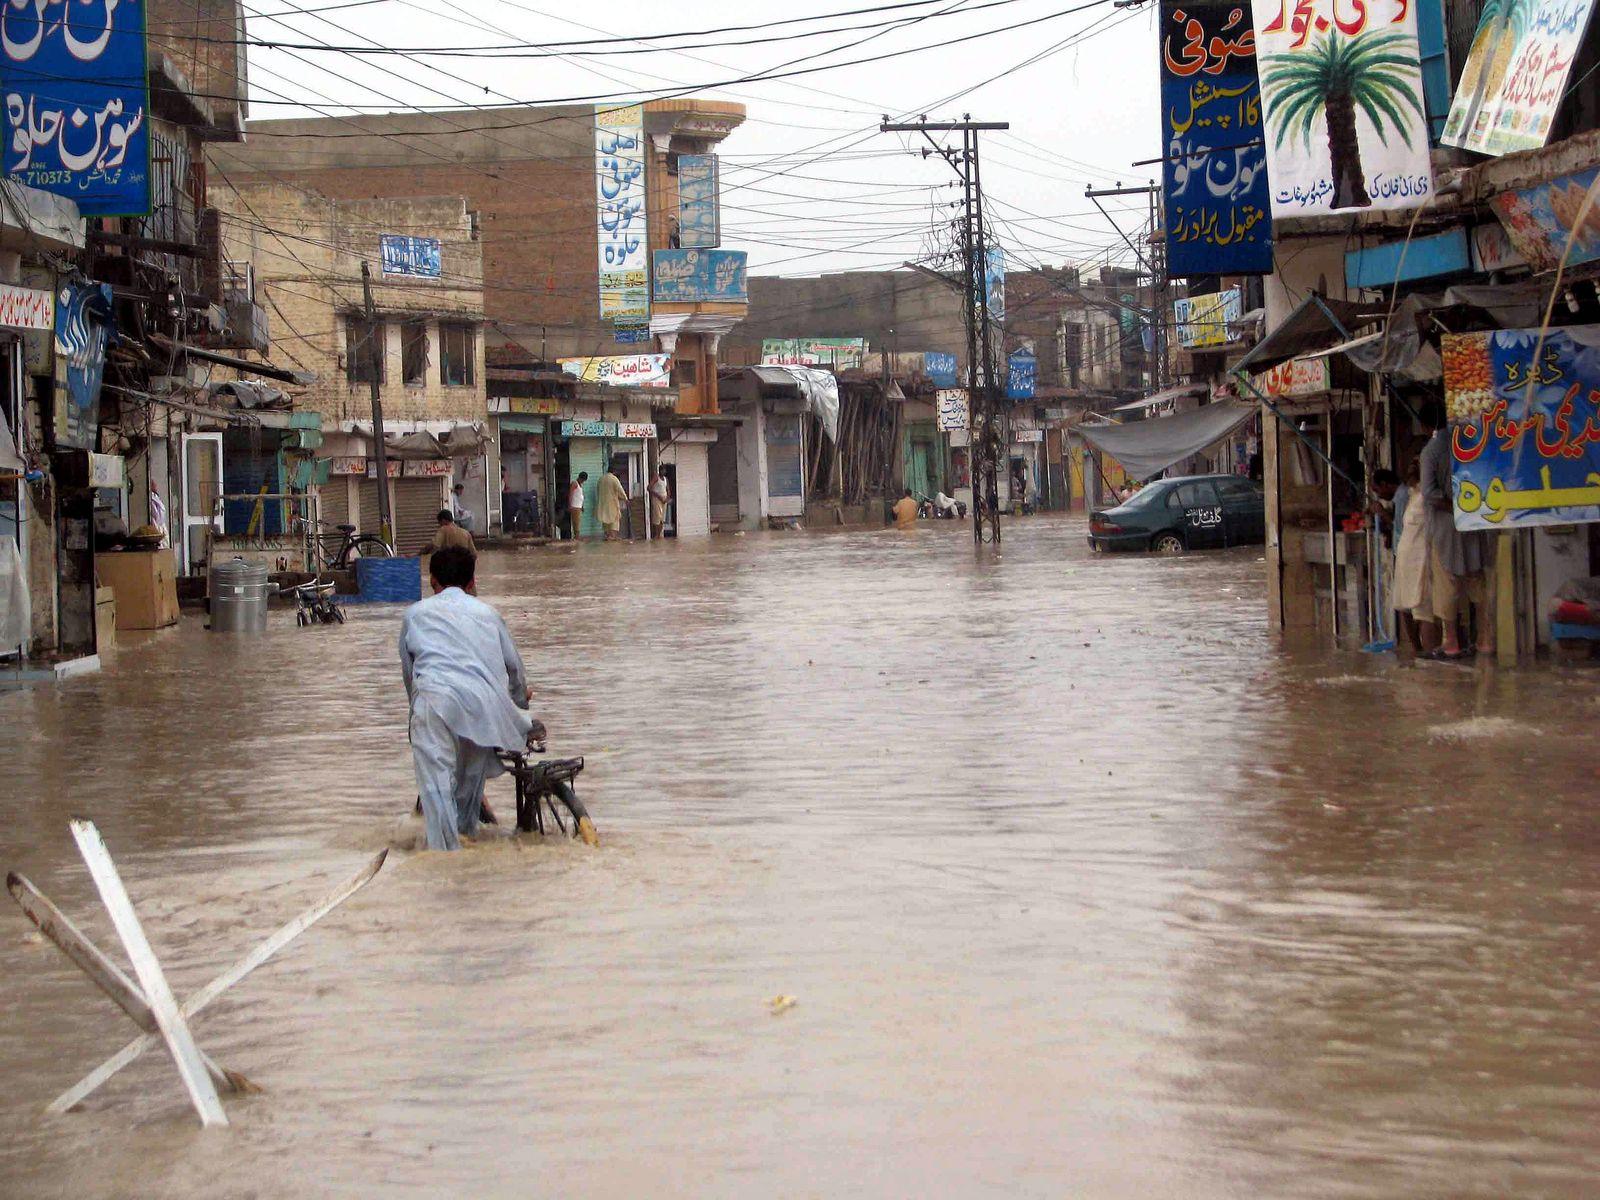 Flut trifft 2,5 Millionen Pakistaner